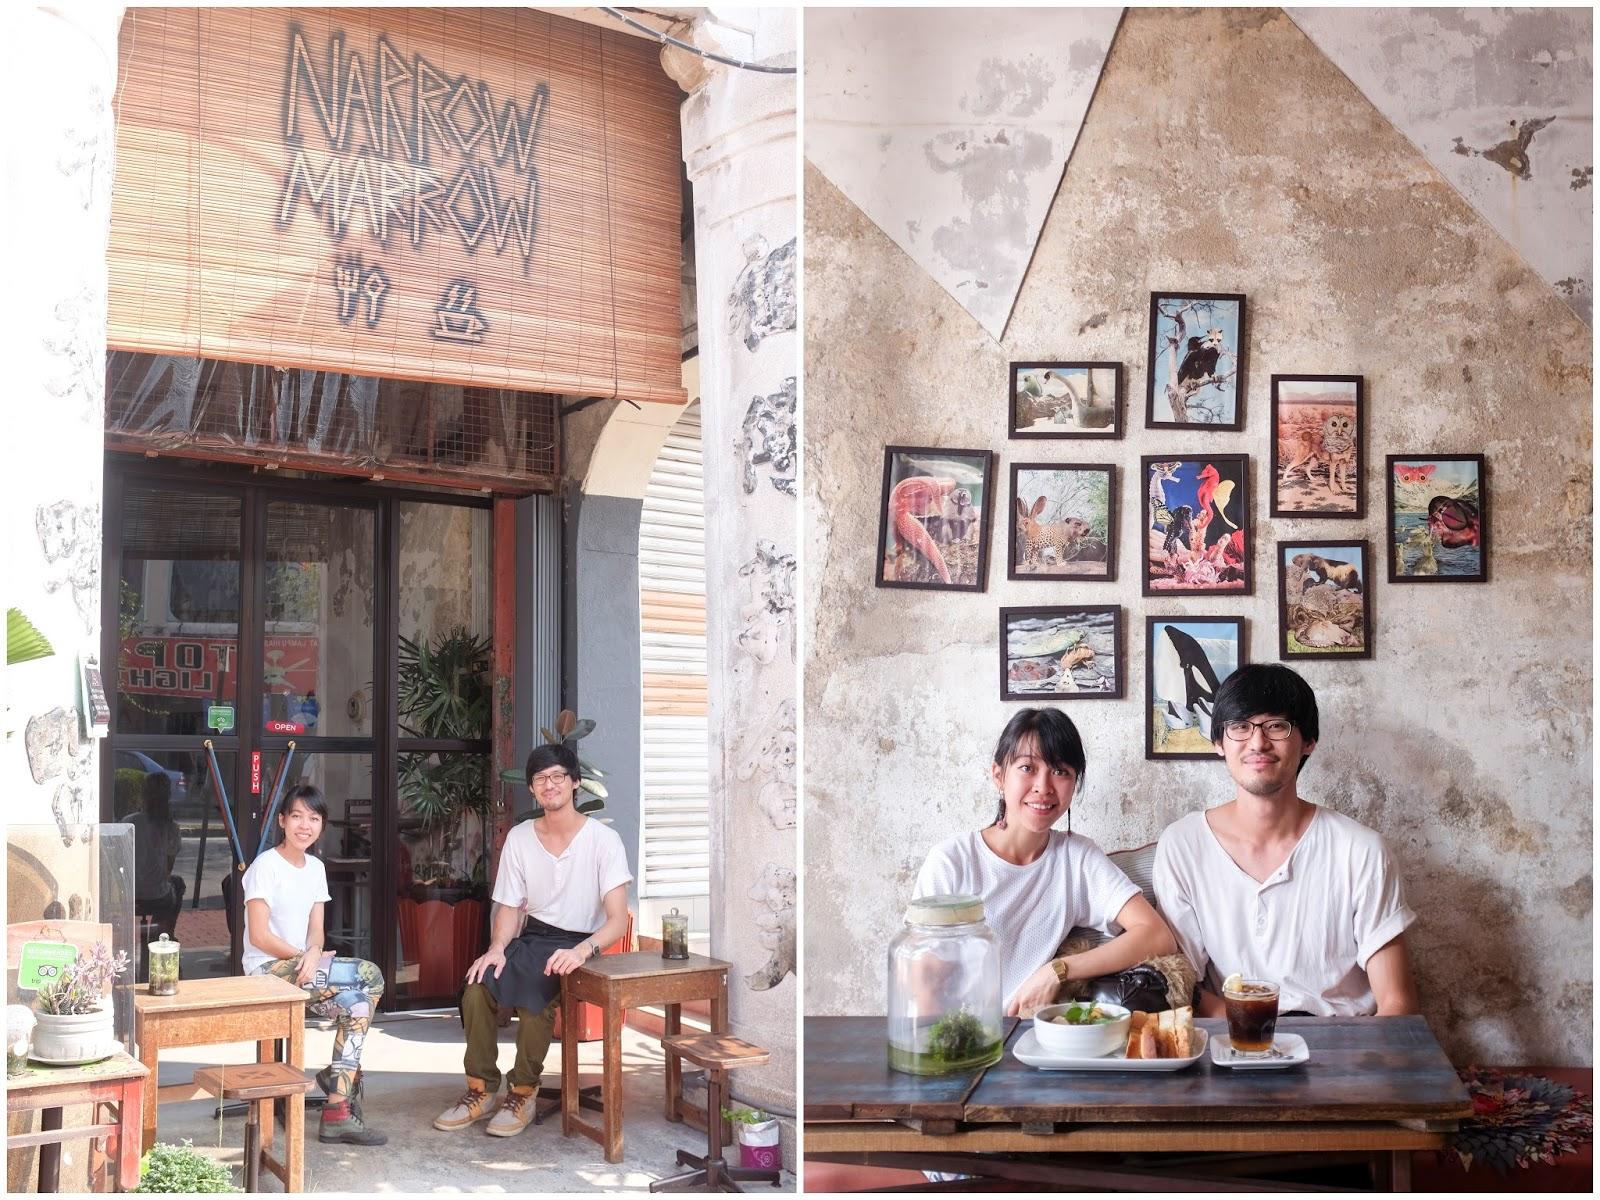 Eat Drink KL: Narrow Marrow & Jawi House @ George Town, Penang